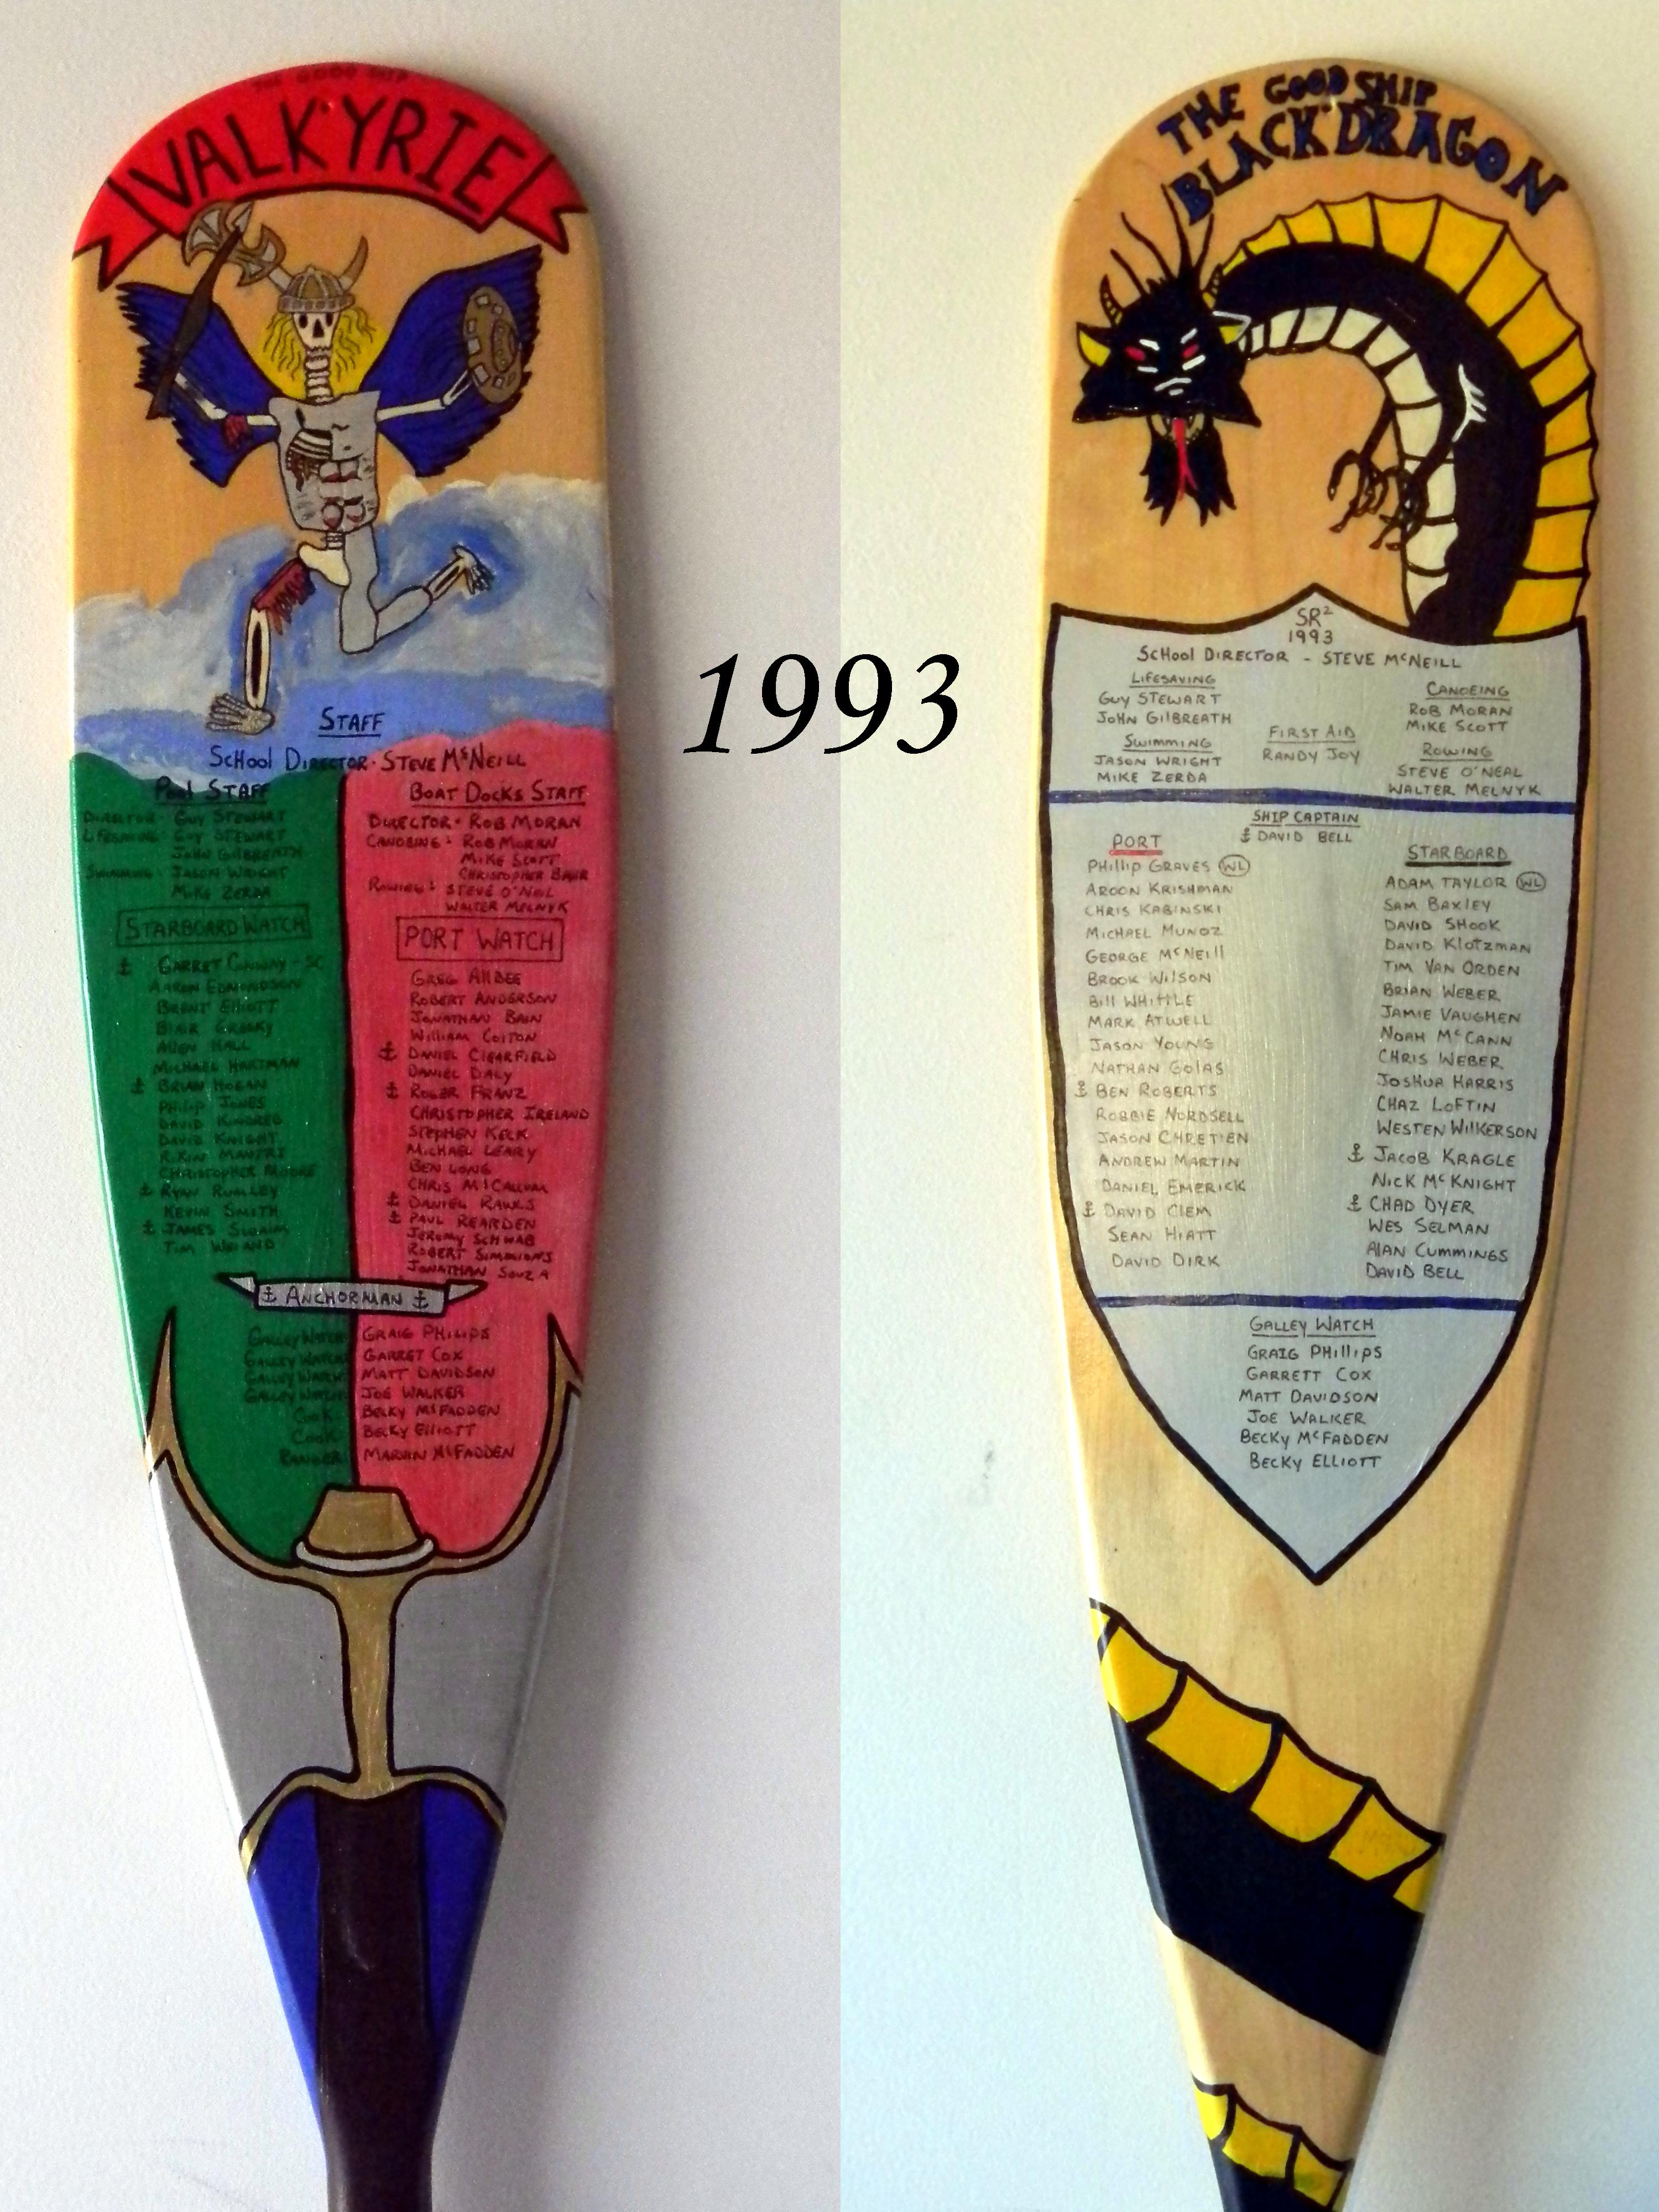 1993.jpg